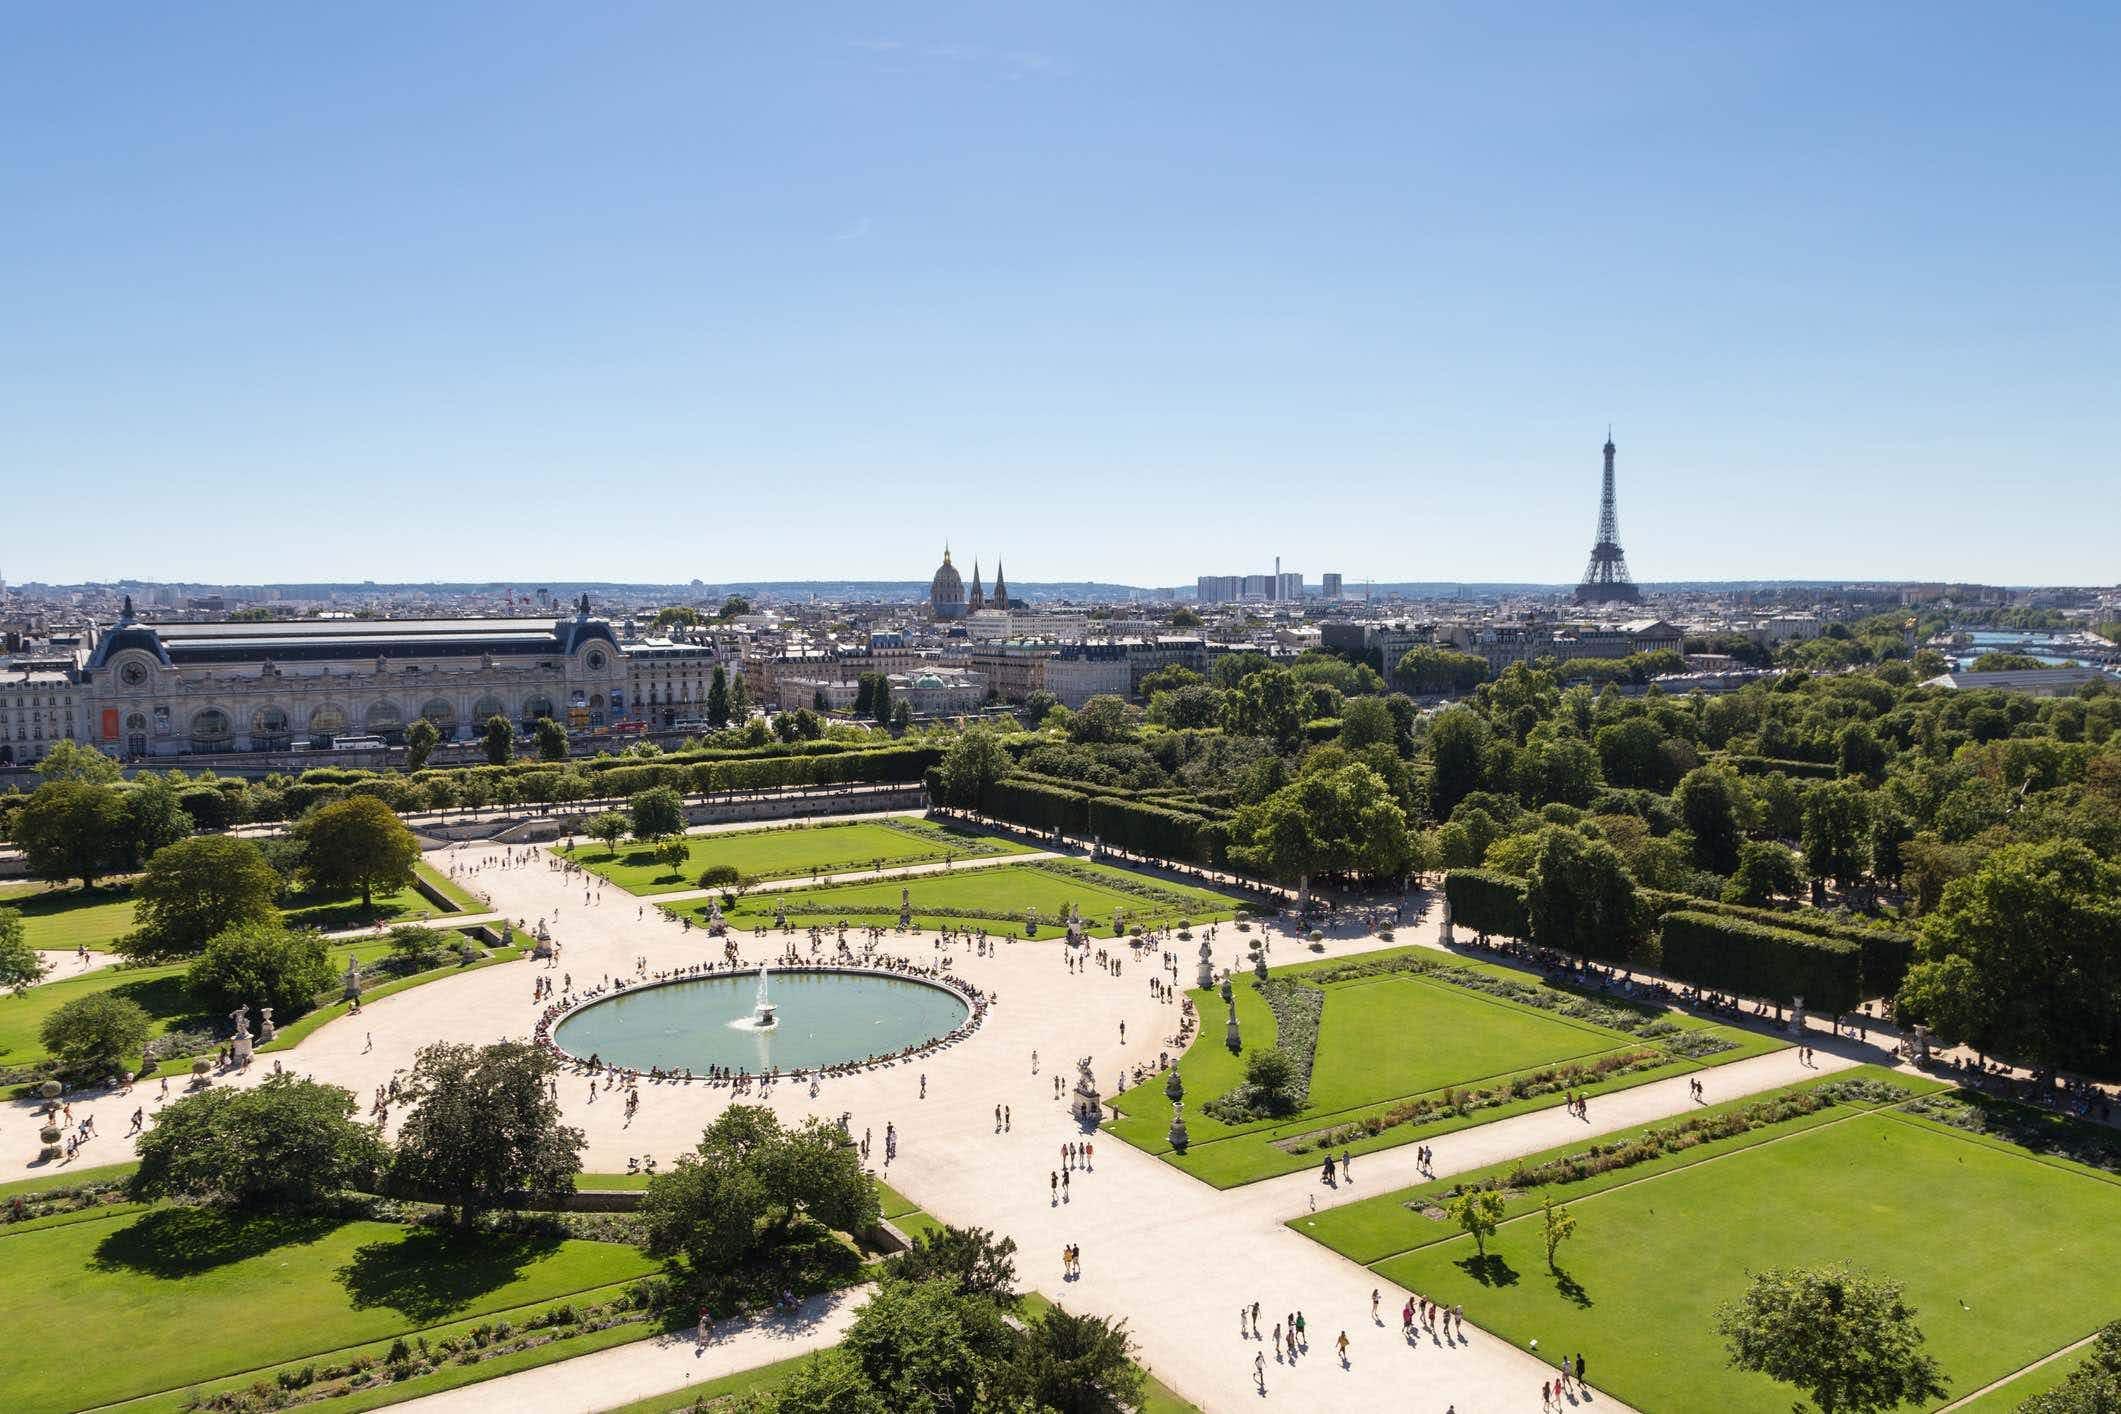 Paris unveils plans for 'urban forests' at major landmarks to combat climate change